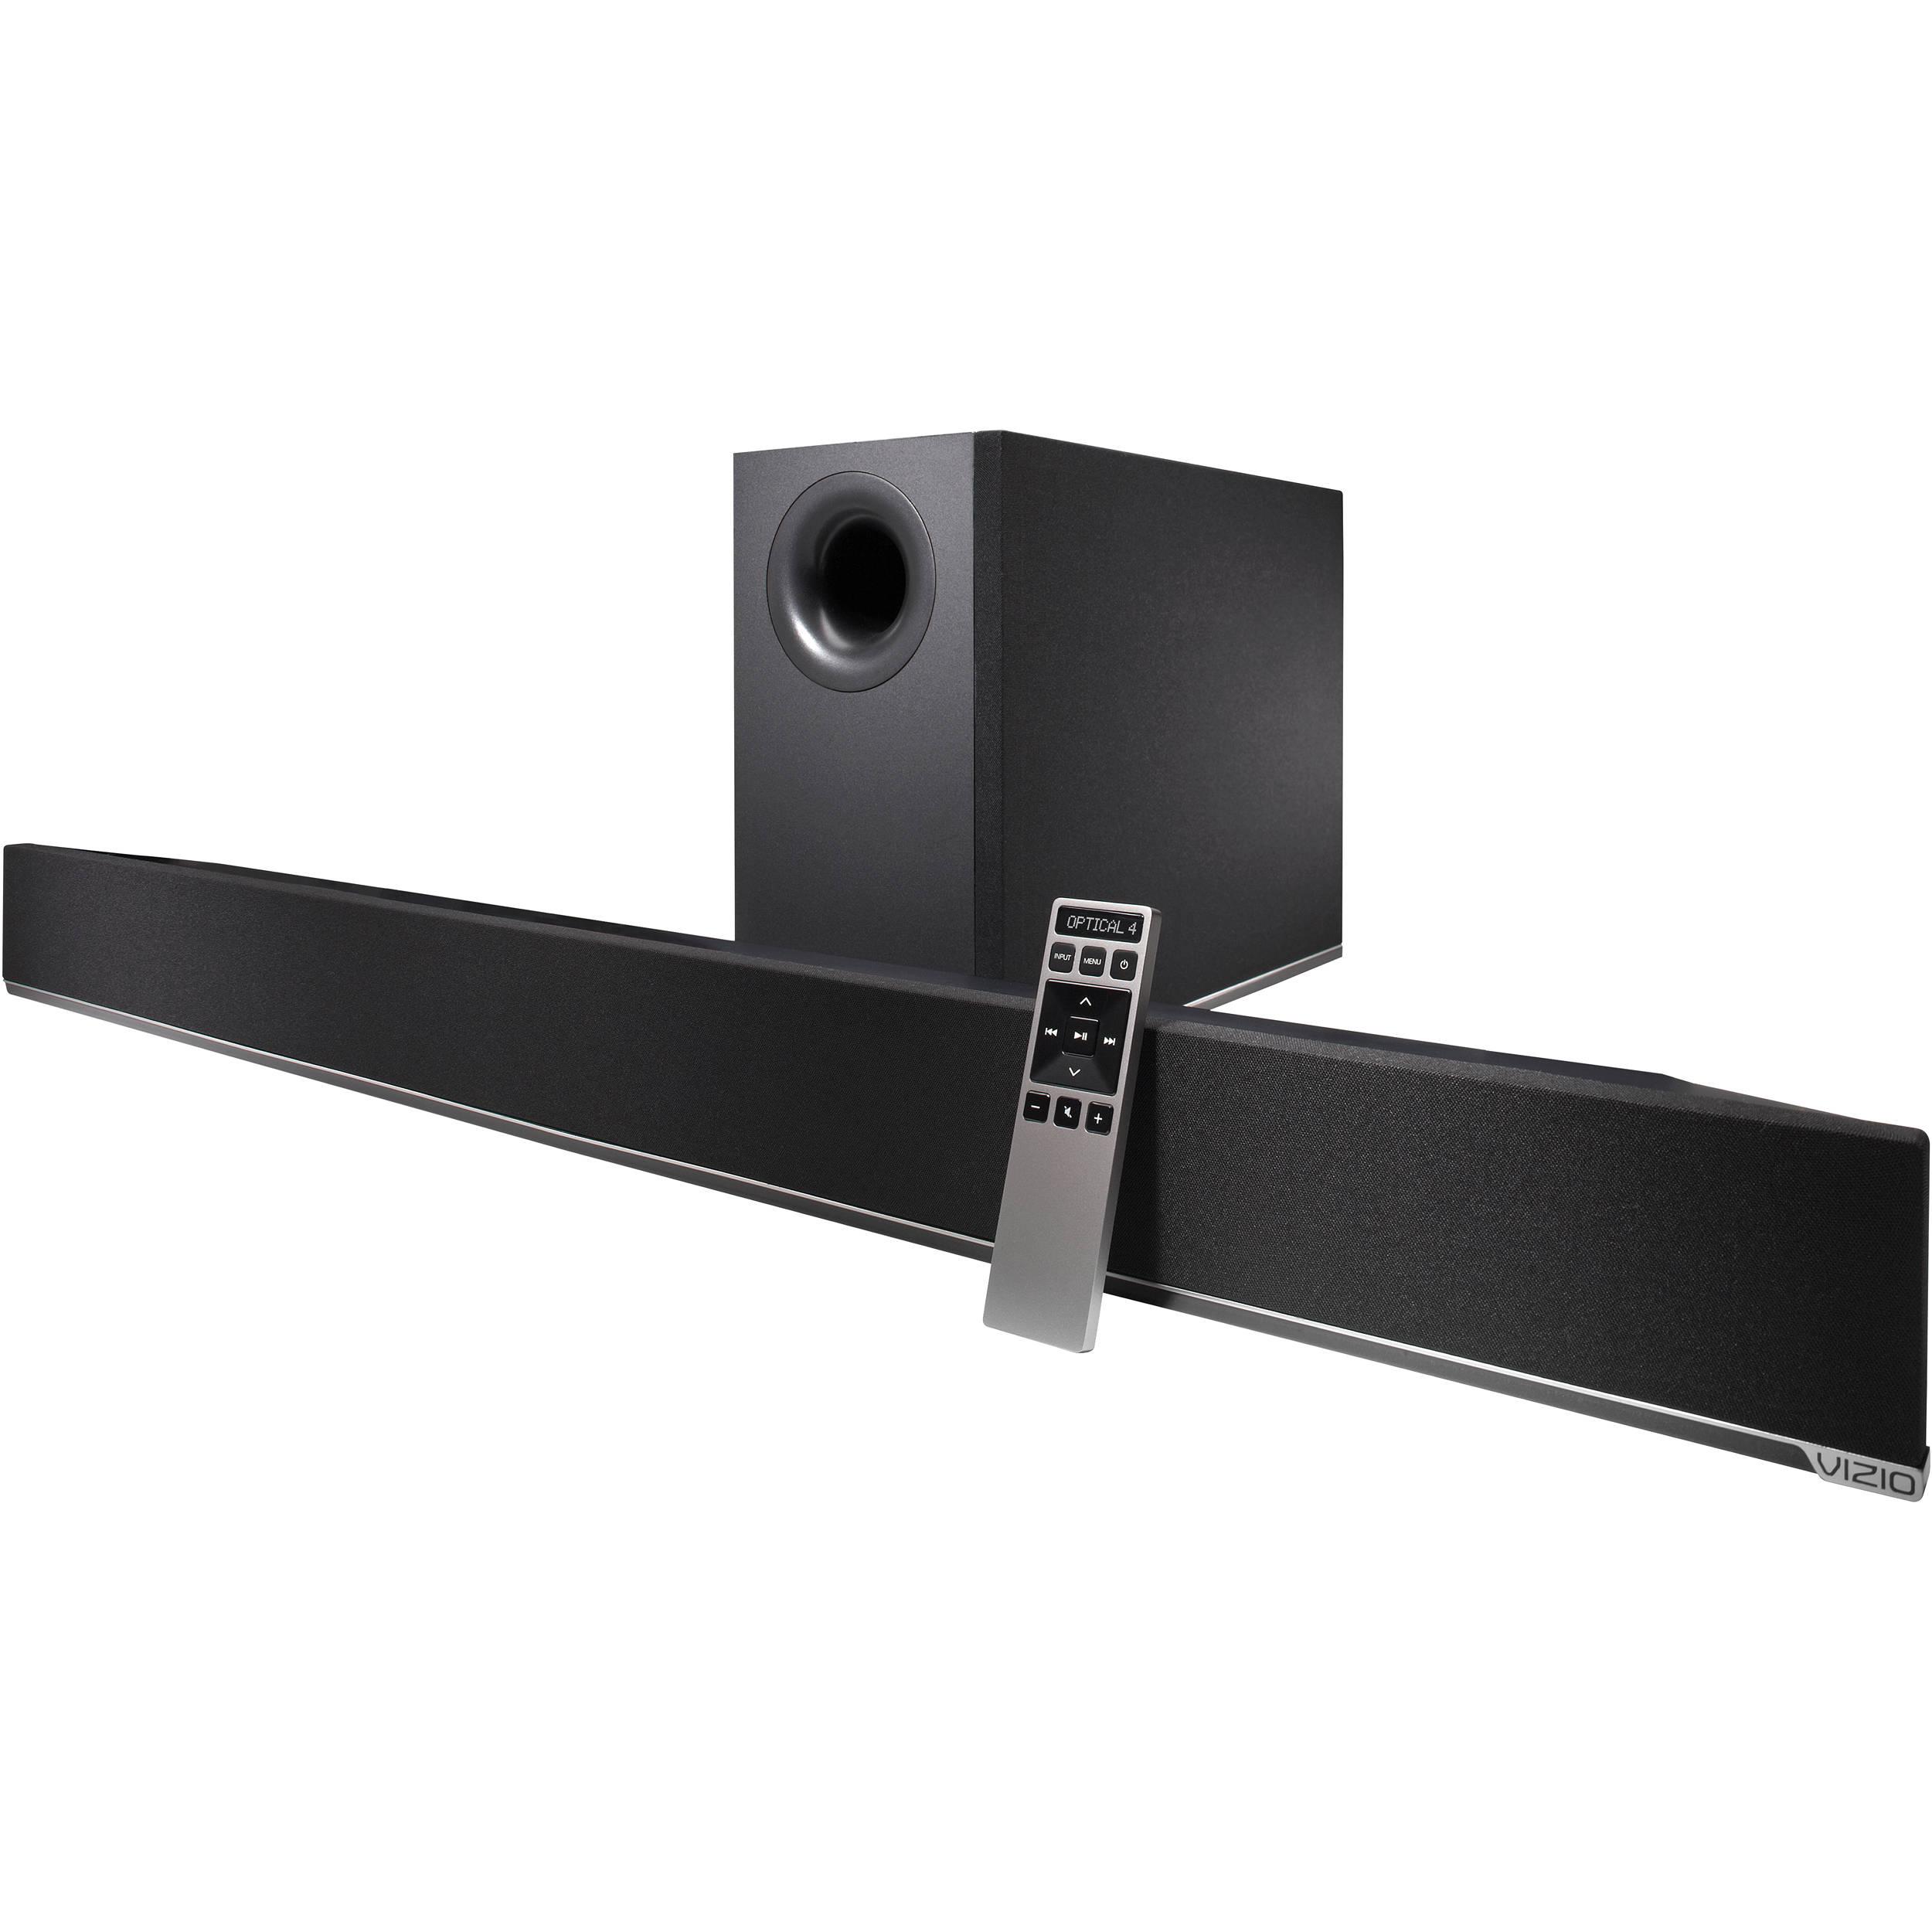 vizio 2.1 soundbar with wireless subwoofer review